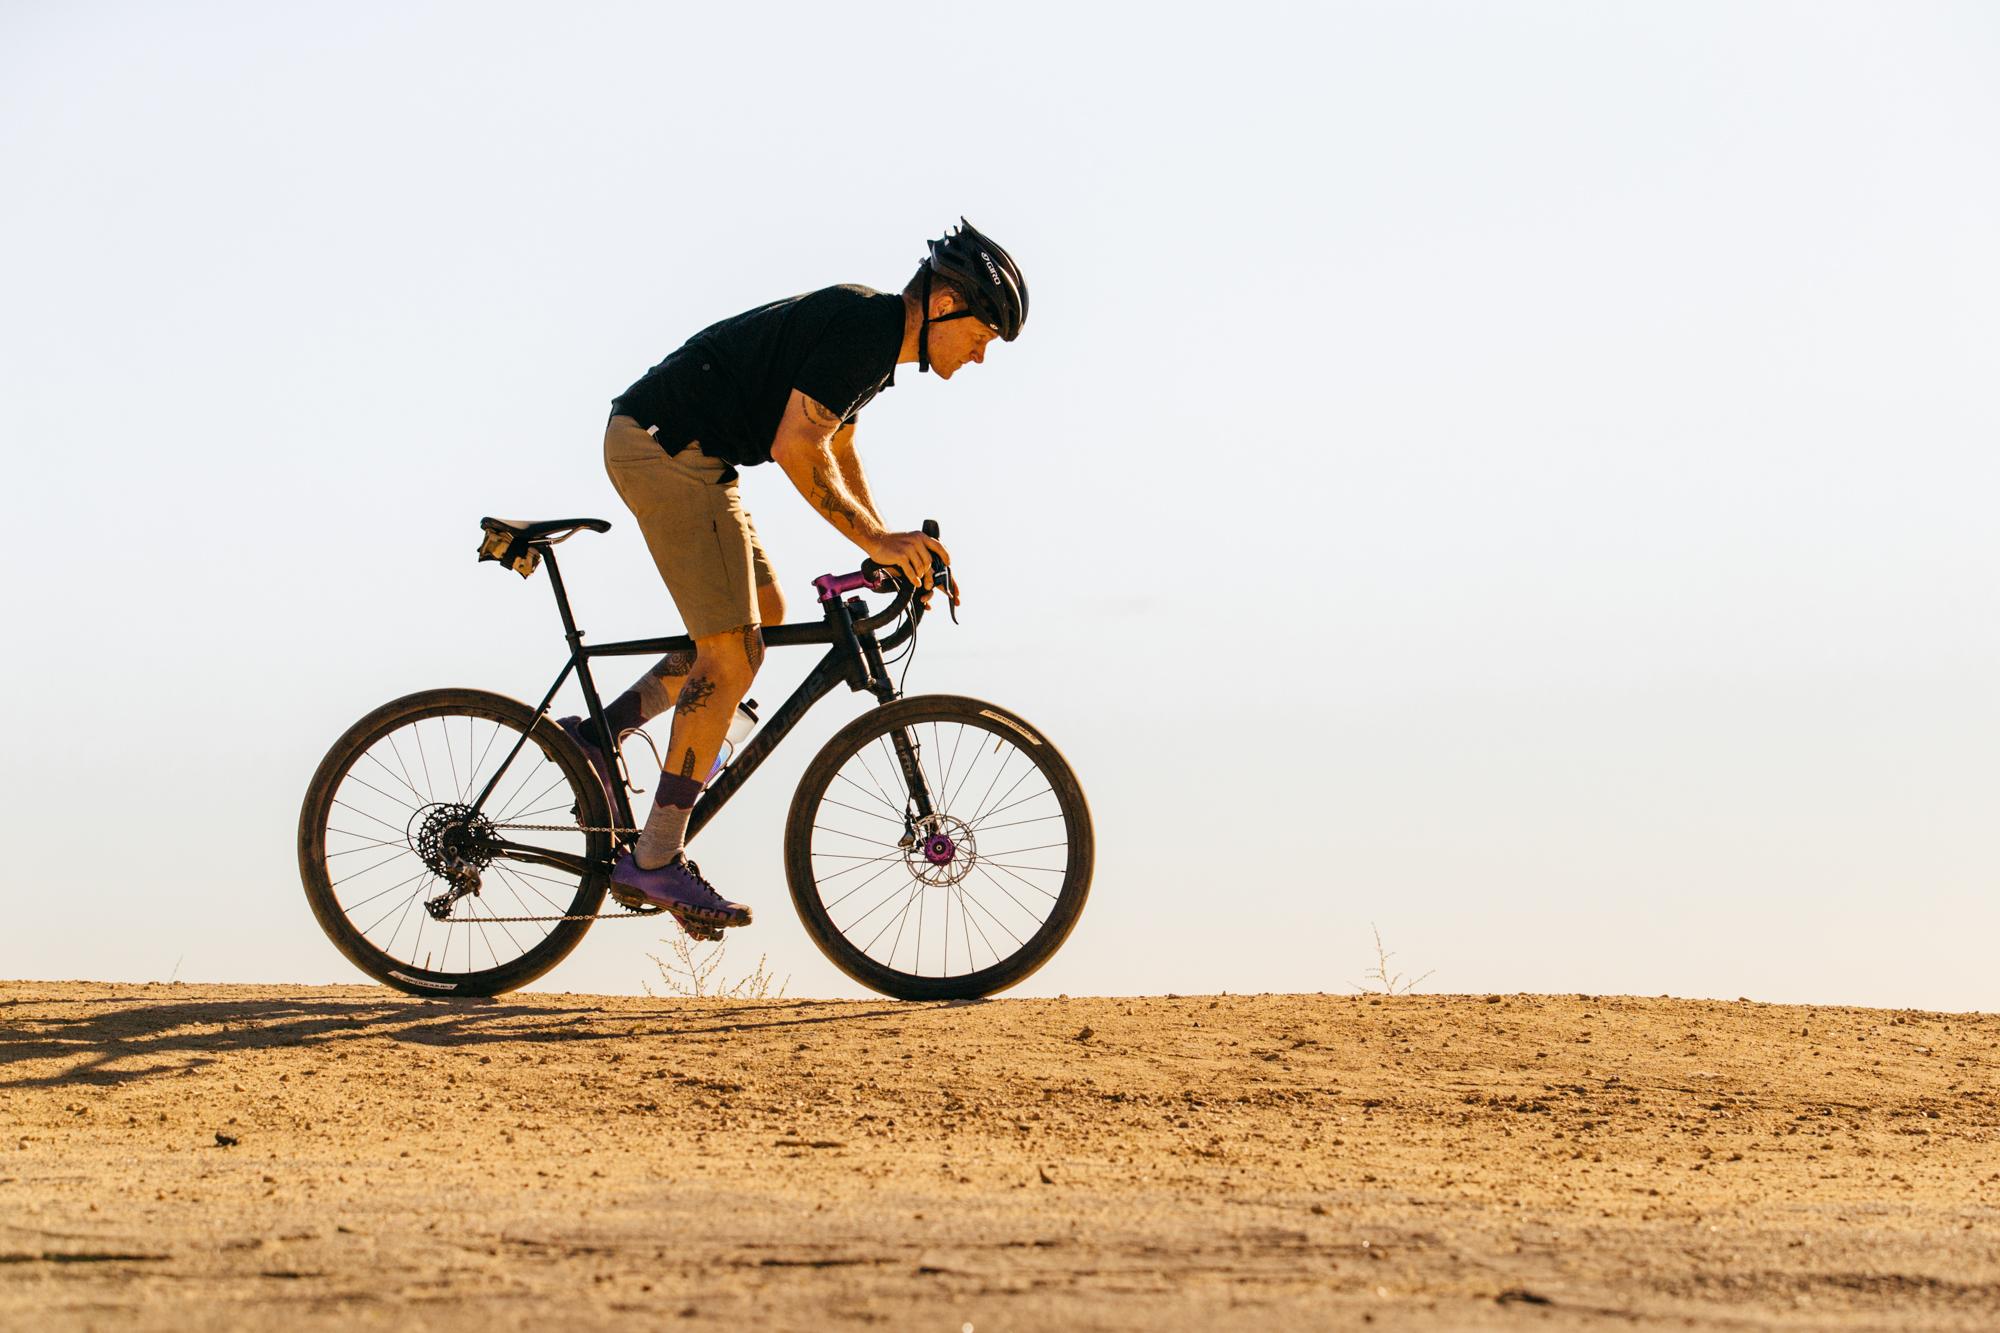 0b6d46eb76e Thrashin' and Crashin' the Cannondale Slate Force CX1 All-Road Bike – John  Watson | The Radavist | A group of individuals who share a love of cycling  and ...